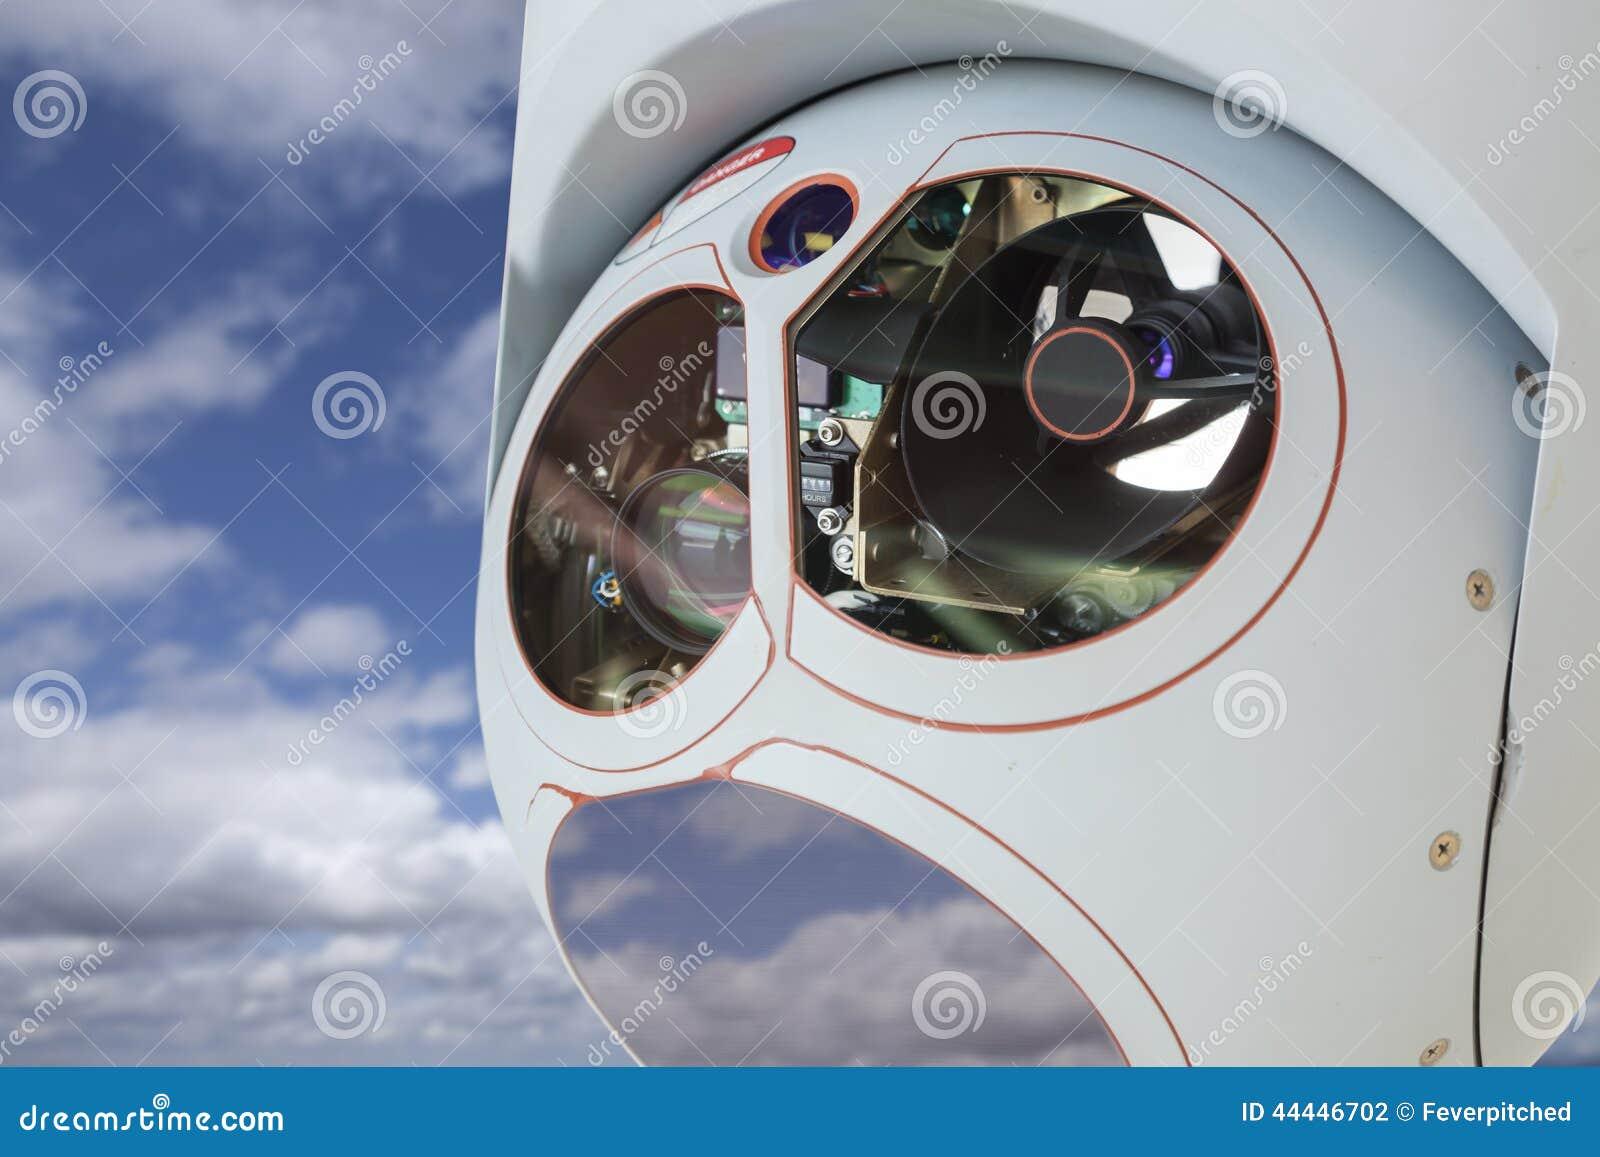 closeup-drone-camera-sensor-pod-module-4